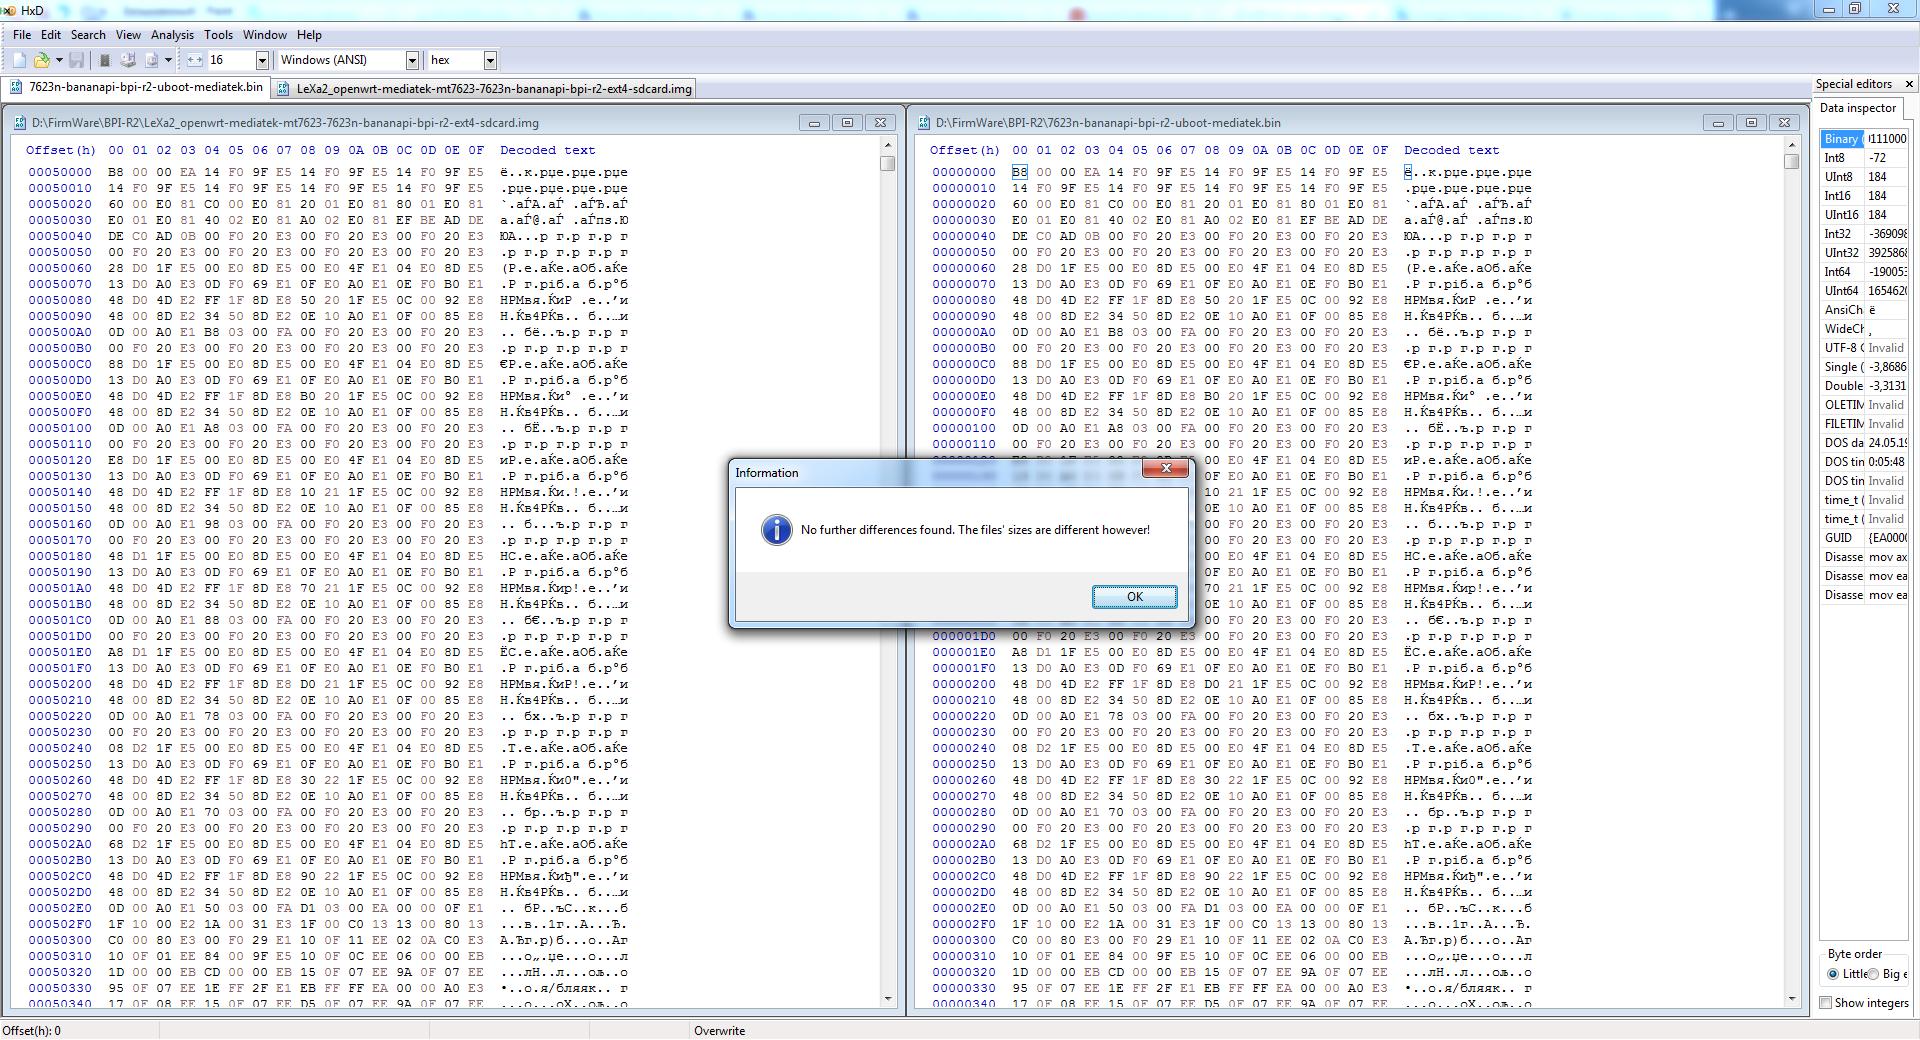 BPI-R2 new image: OpenWrt 18 06 2 source code fork - Banana